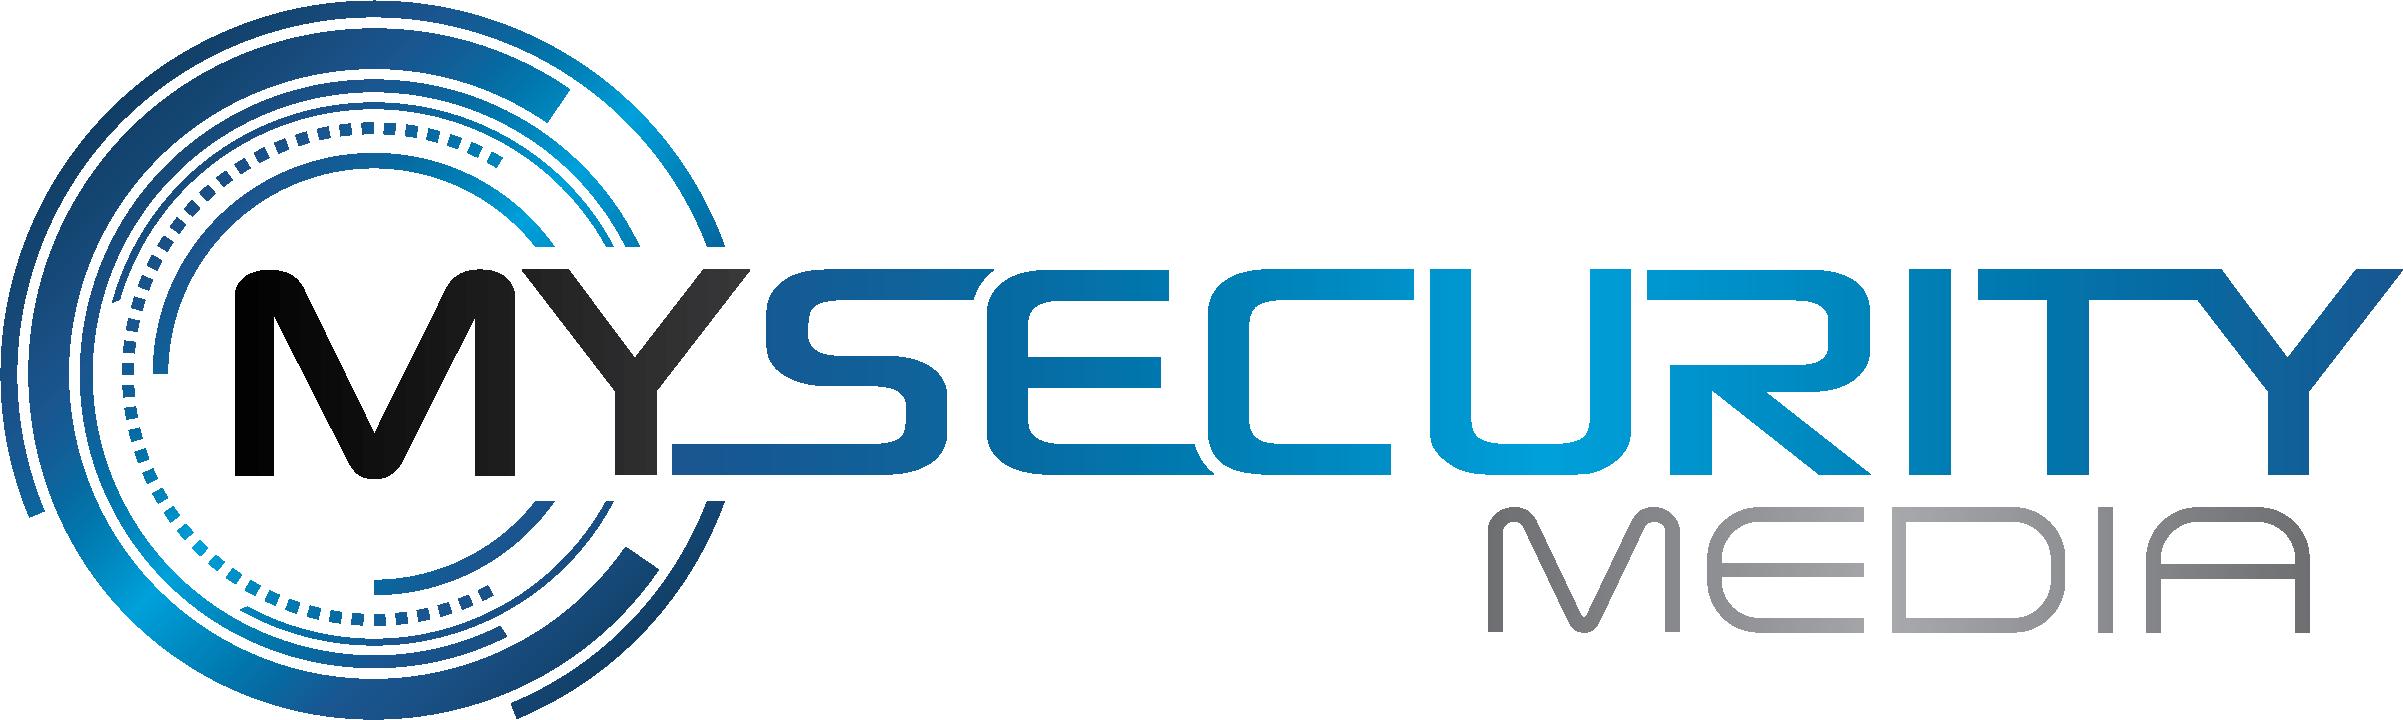 MySecurityMedia